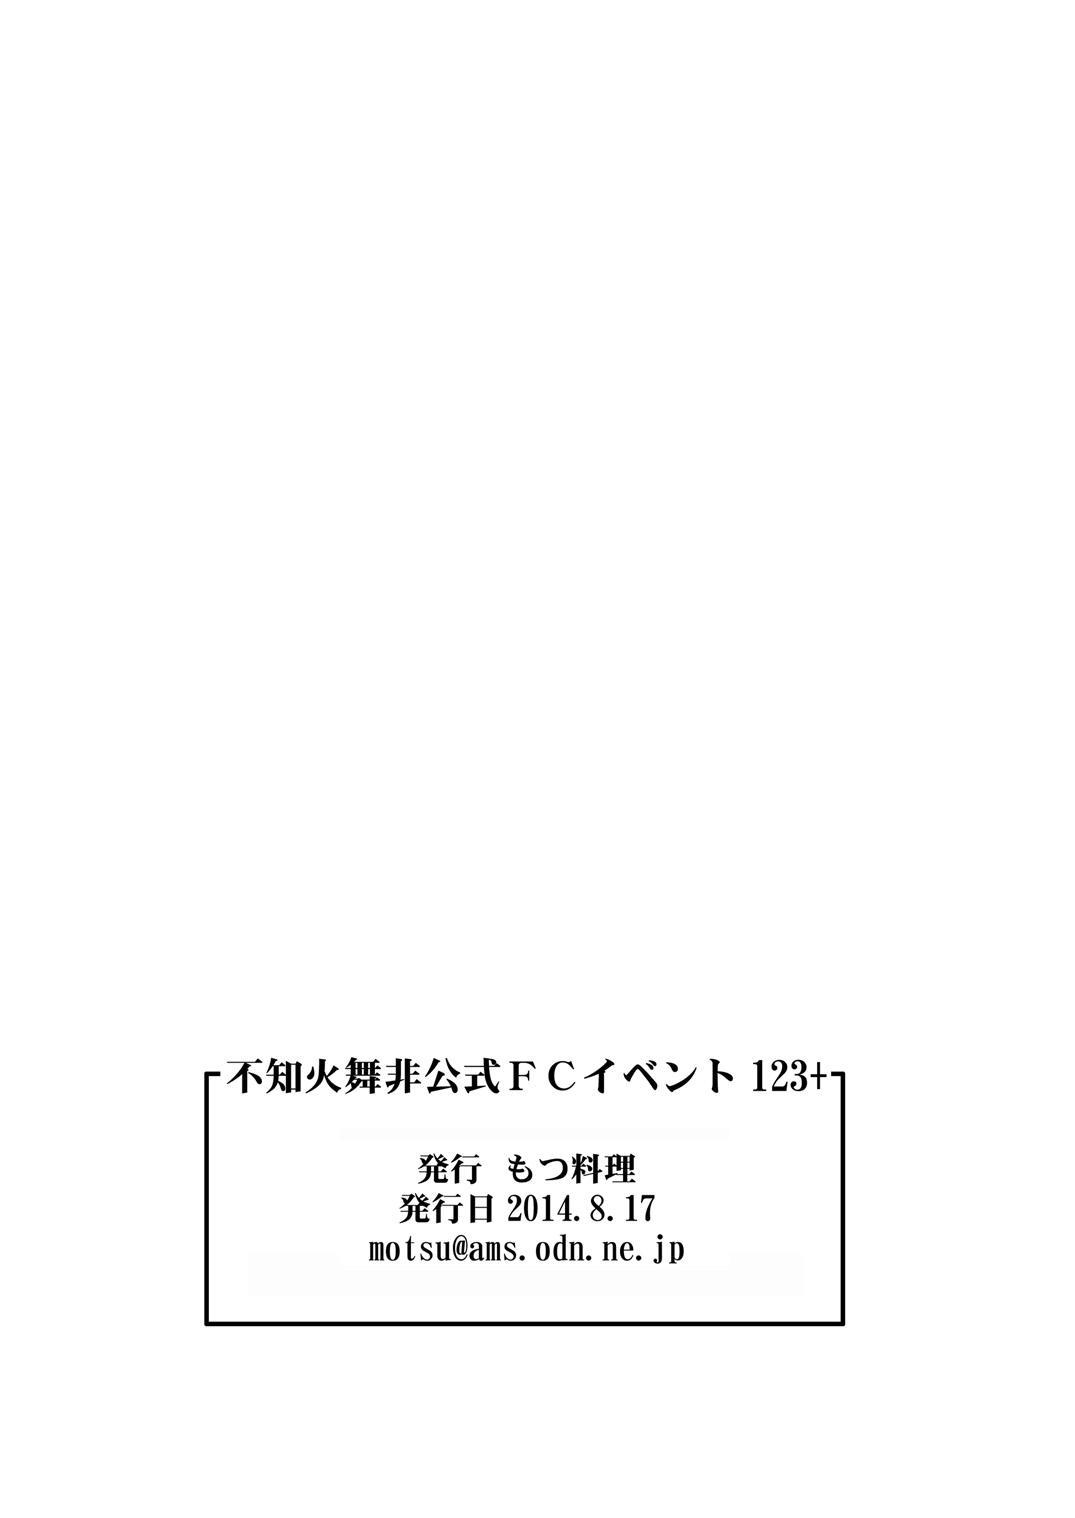 Shiranui Mai Hikoushiki FC Event 123+ 64